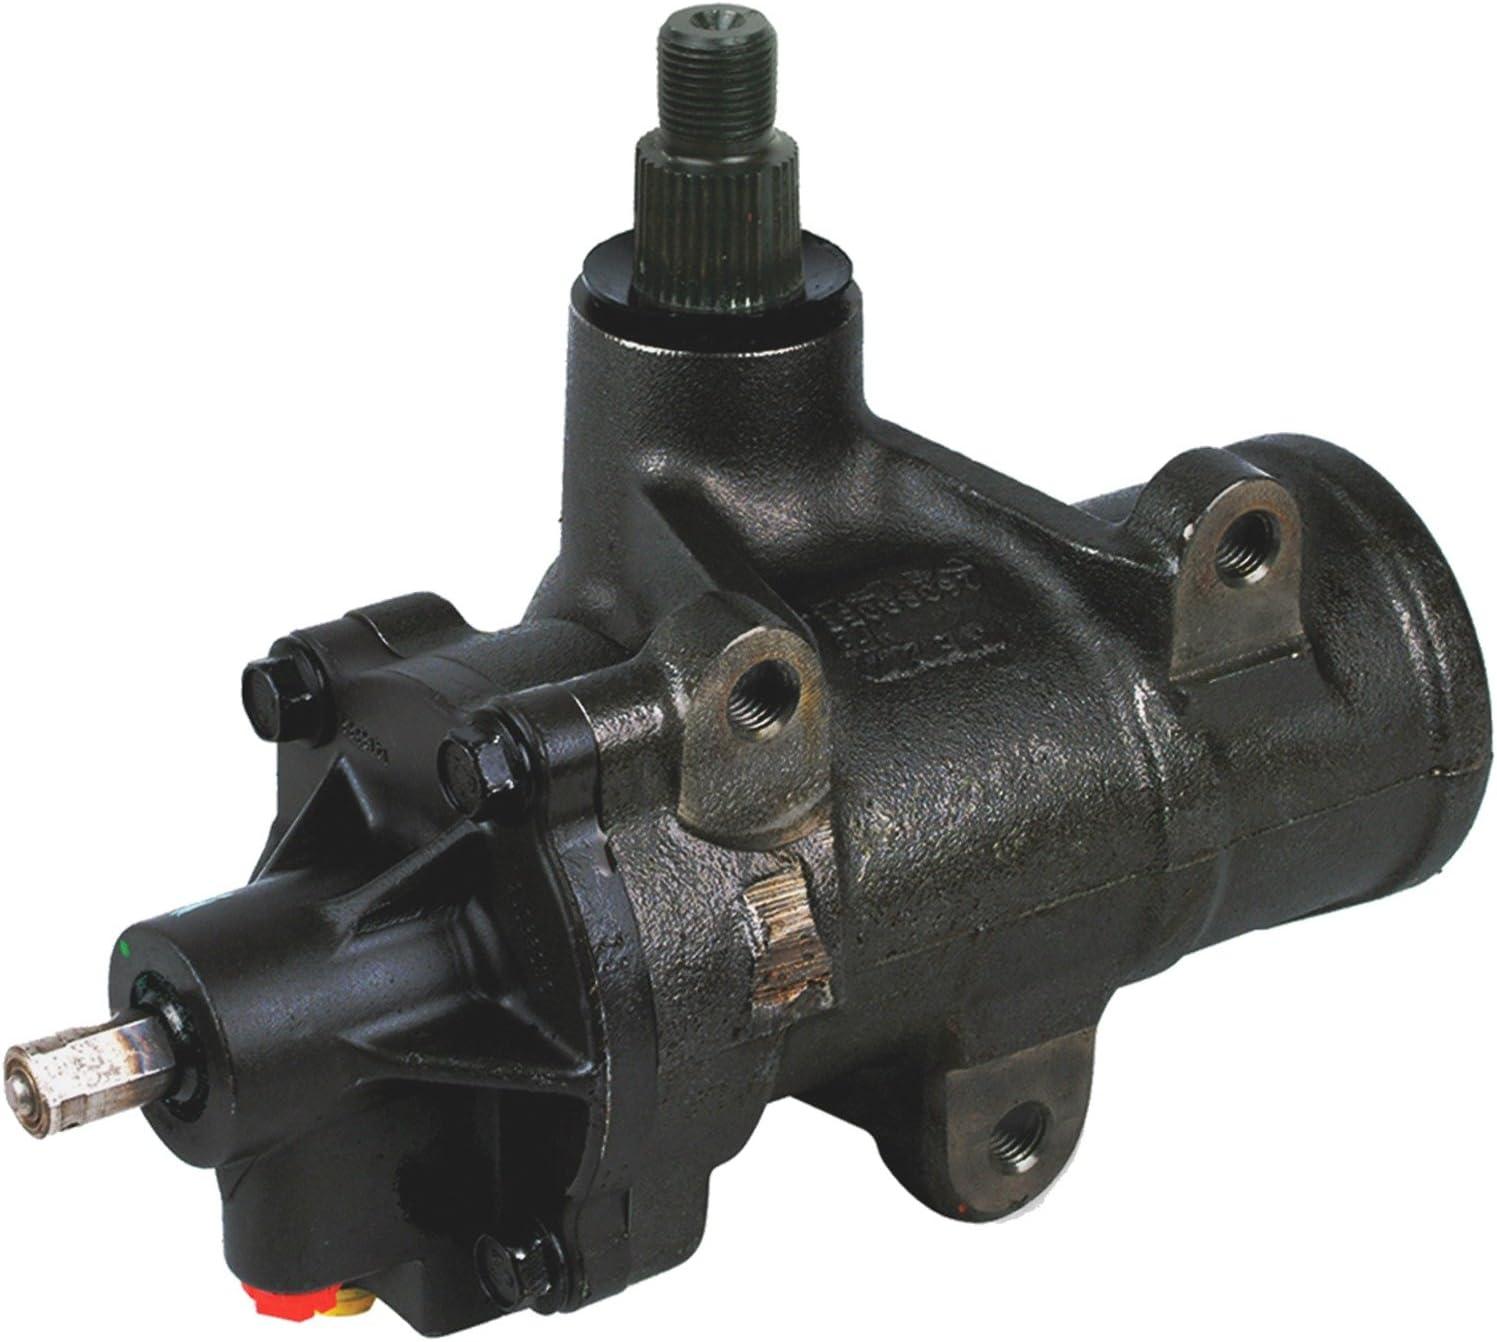 Cardone 27-8413 Remanufactured Power Steering Gear